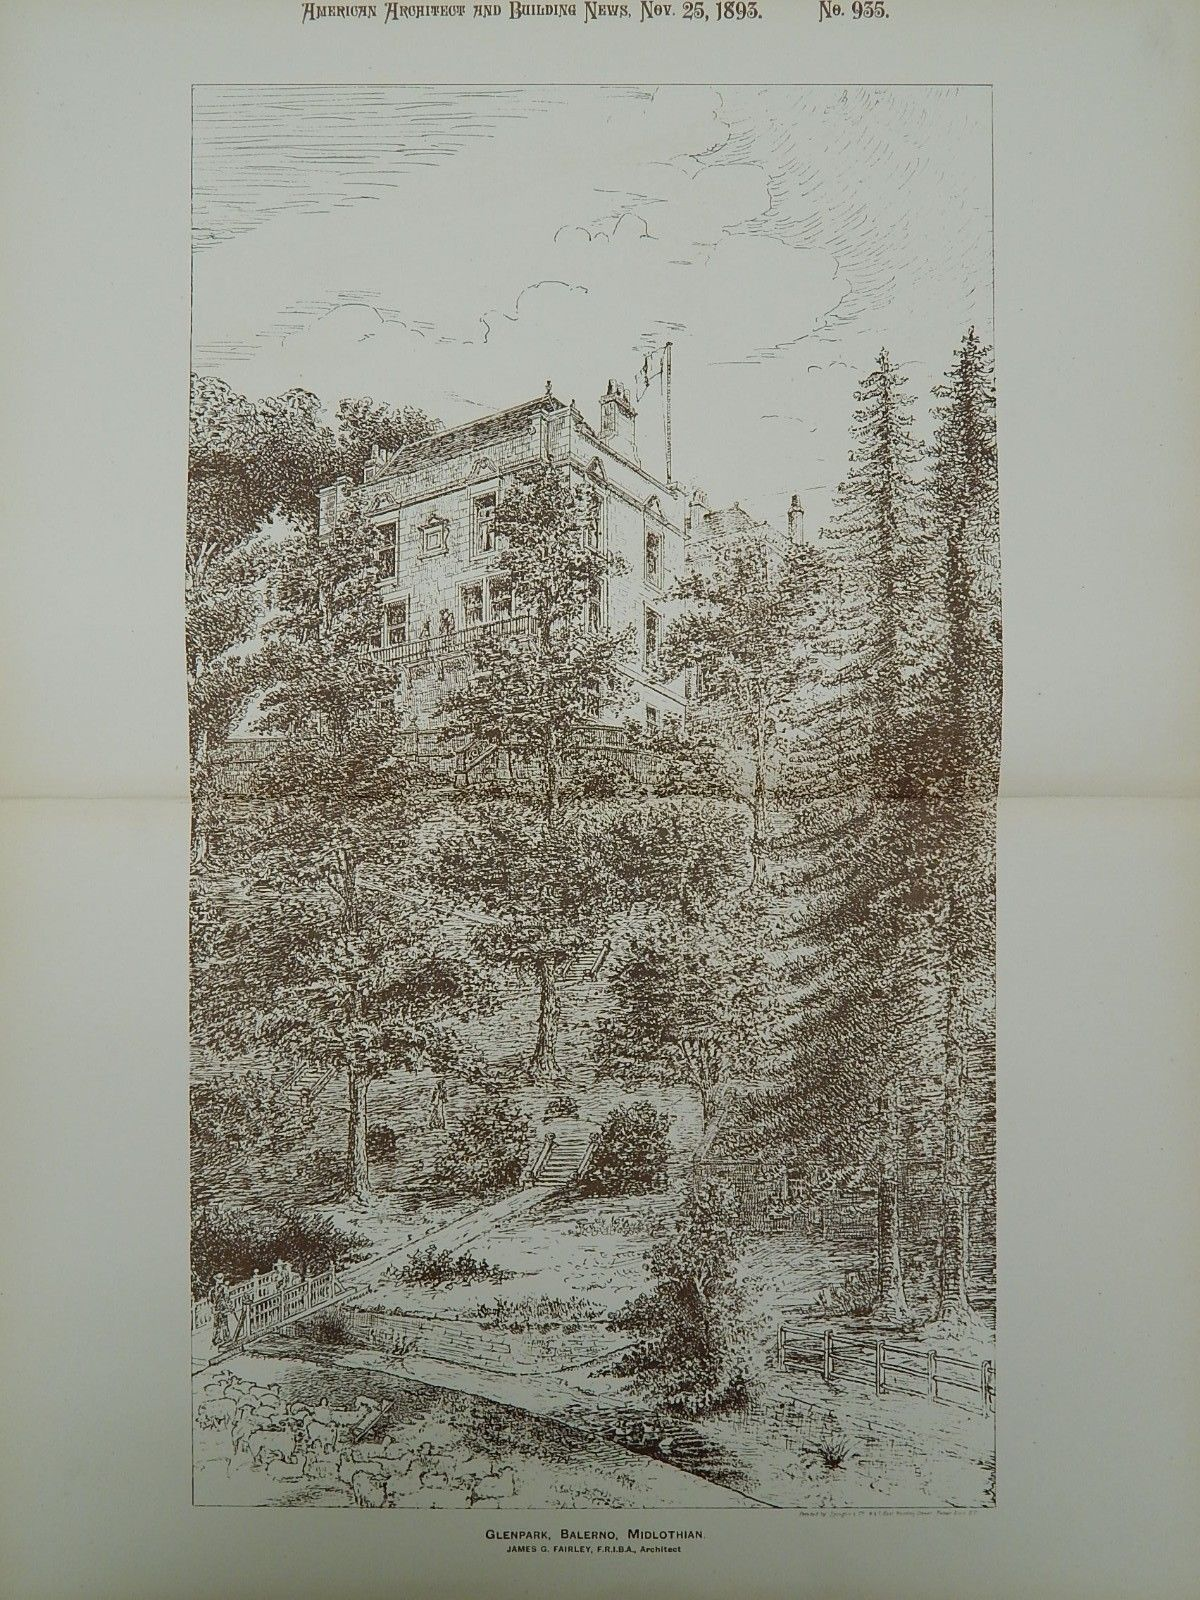 Glenpark, Balerno, Midlothian, Scotland, 1893, James G. Fairley.